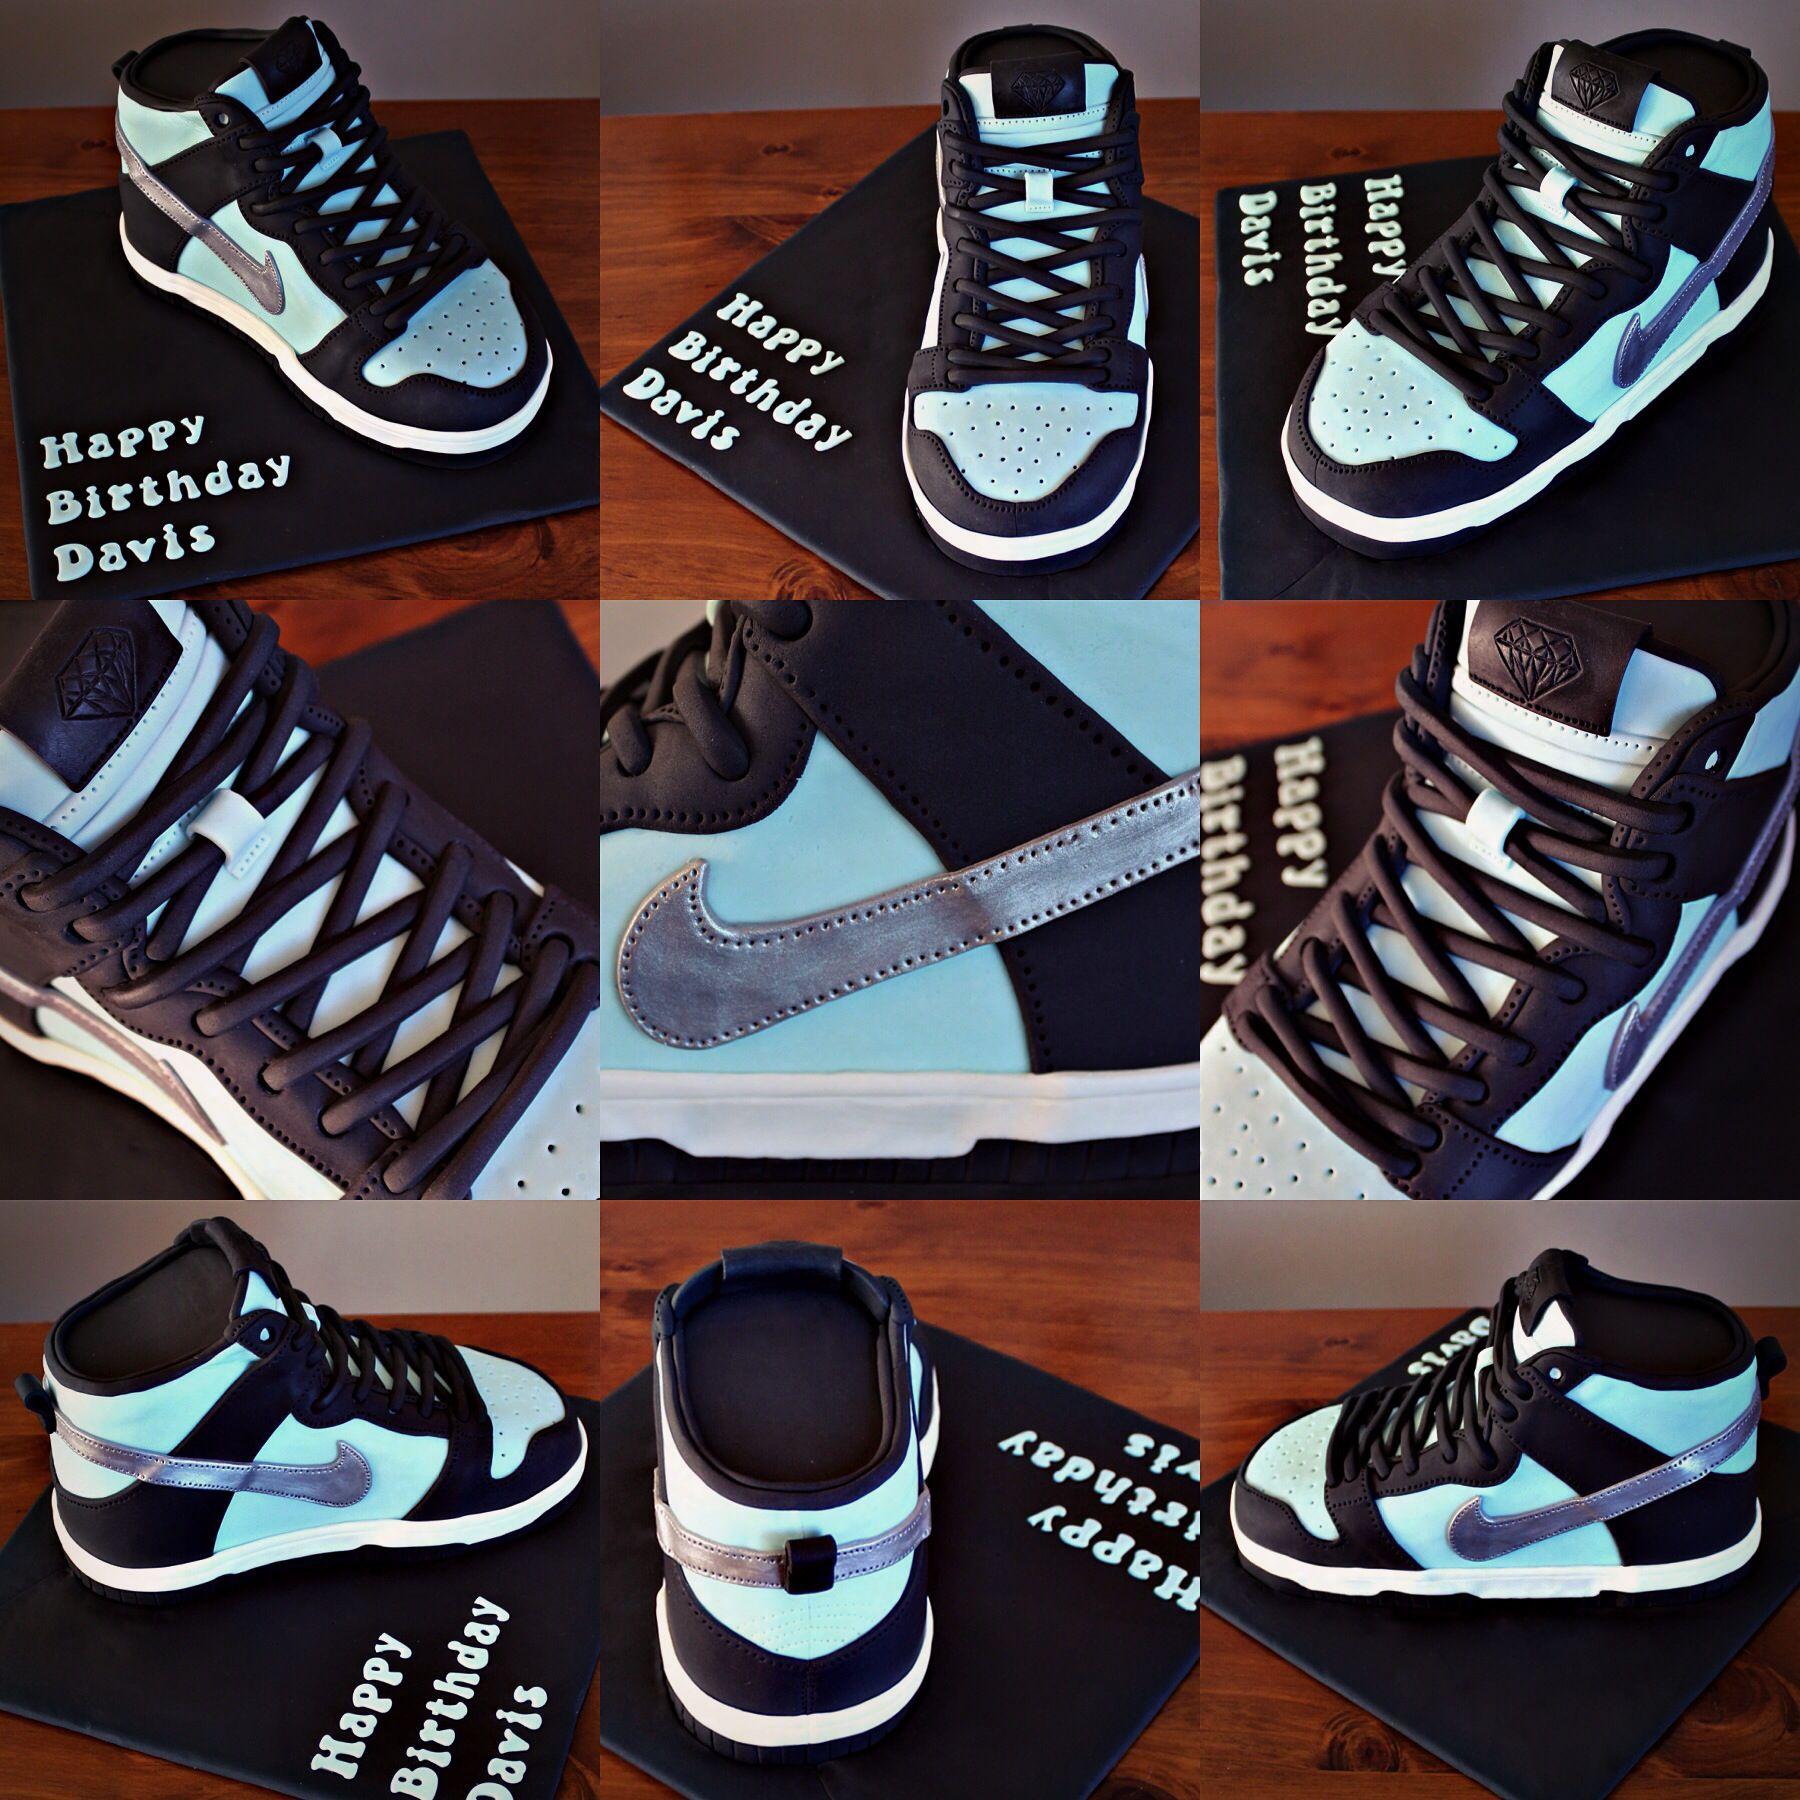 finest selection 86580 a693e Diamond Supply Co. x Nike SB Dunk High